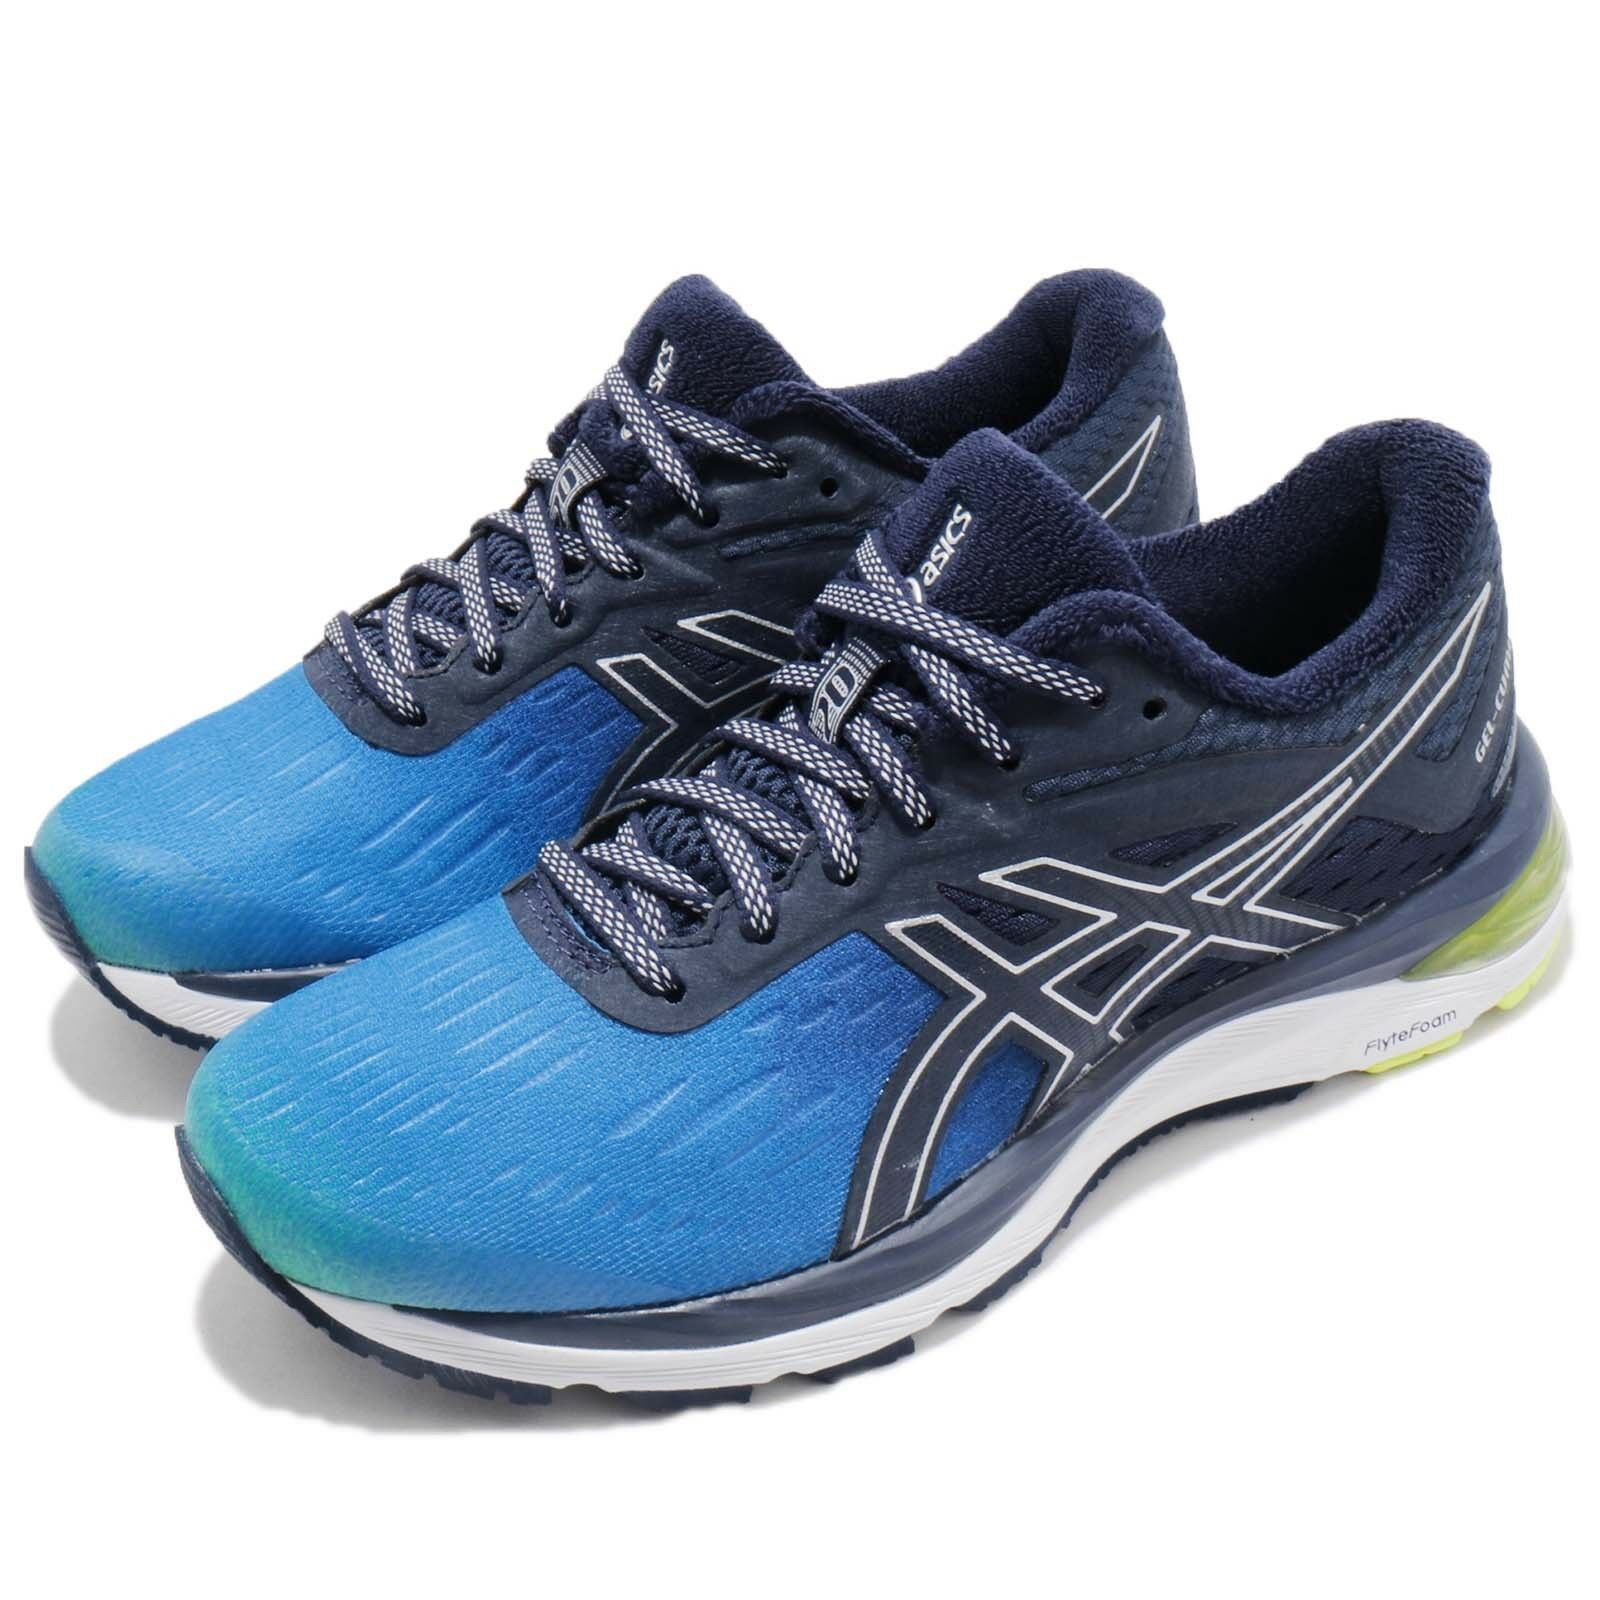 Asics Gel-Cumulus 20 SP Island blueee Peacoat Women Running shoes 1012A124-400